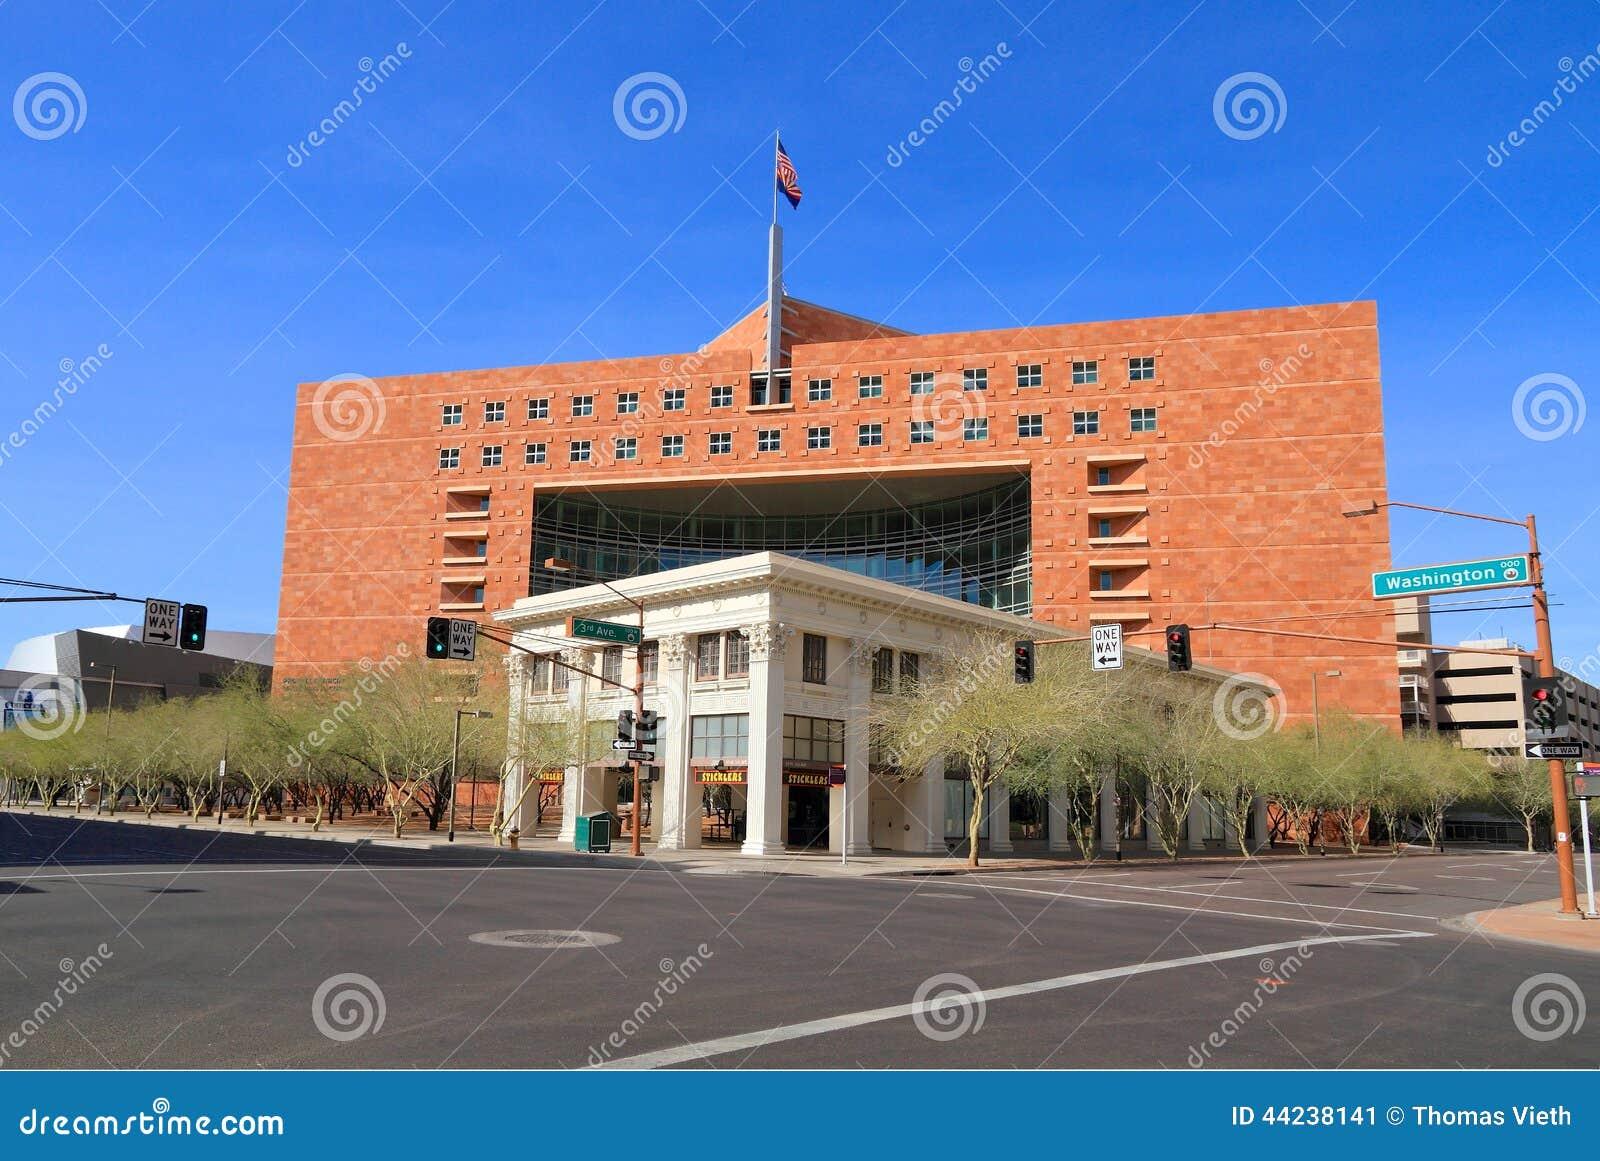 Usa az phoenix walker building municipal court for Building a house in arizona